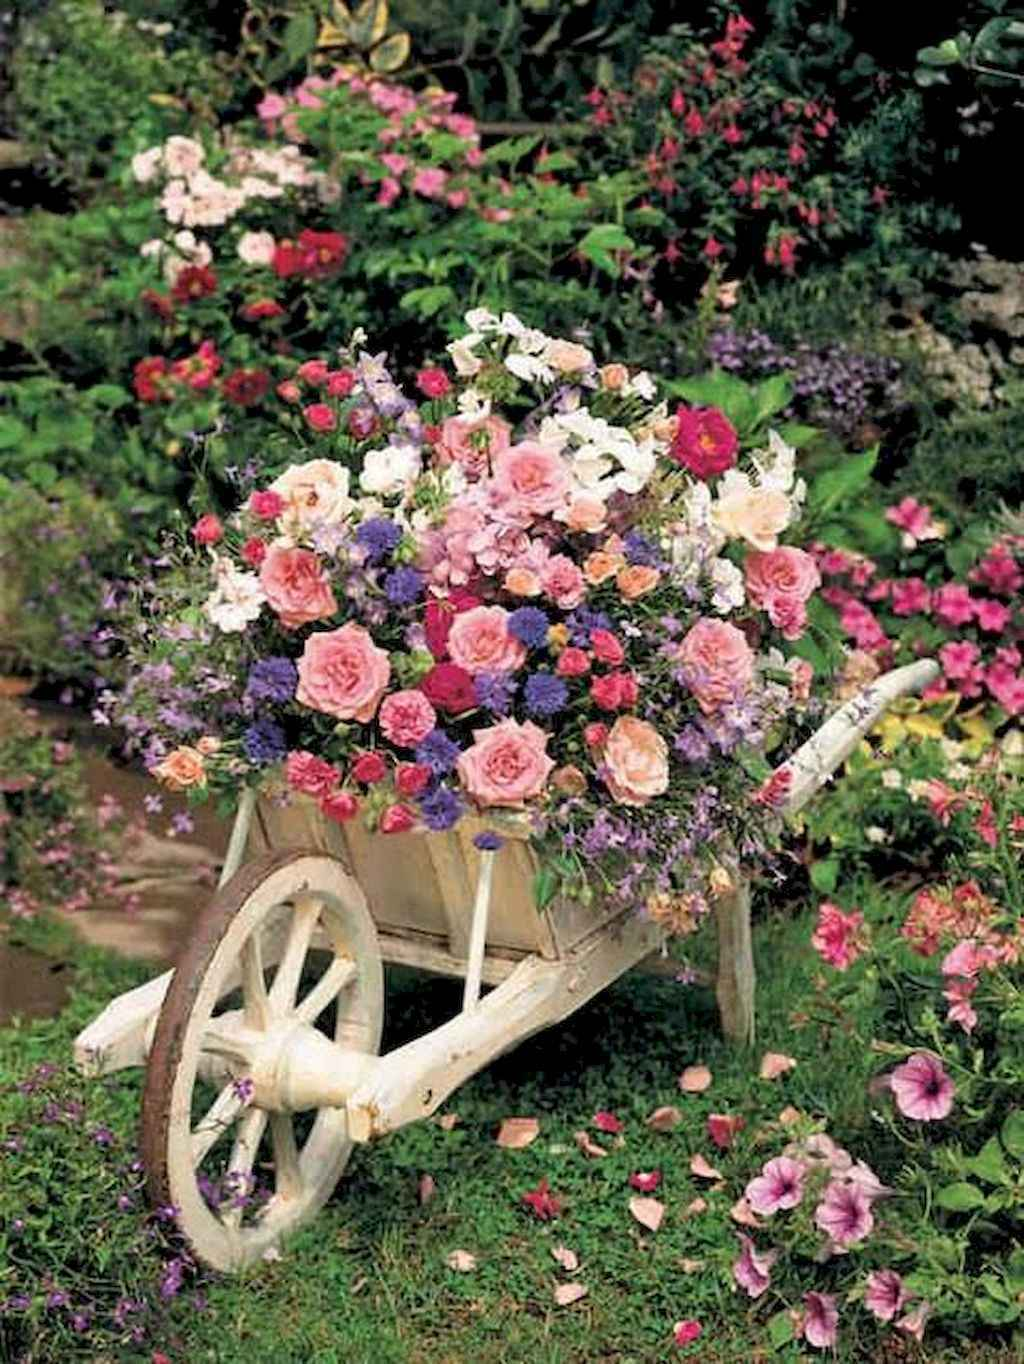 50 cheap and easy flower garden ideas (8)